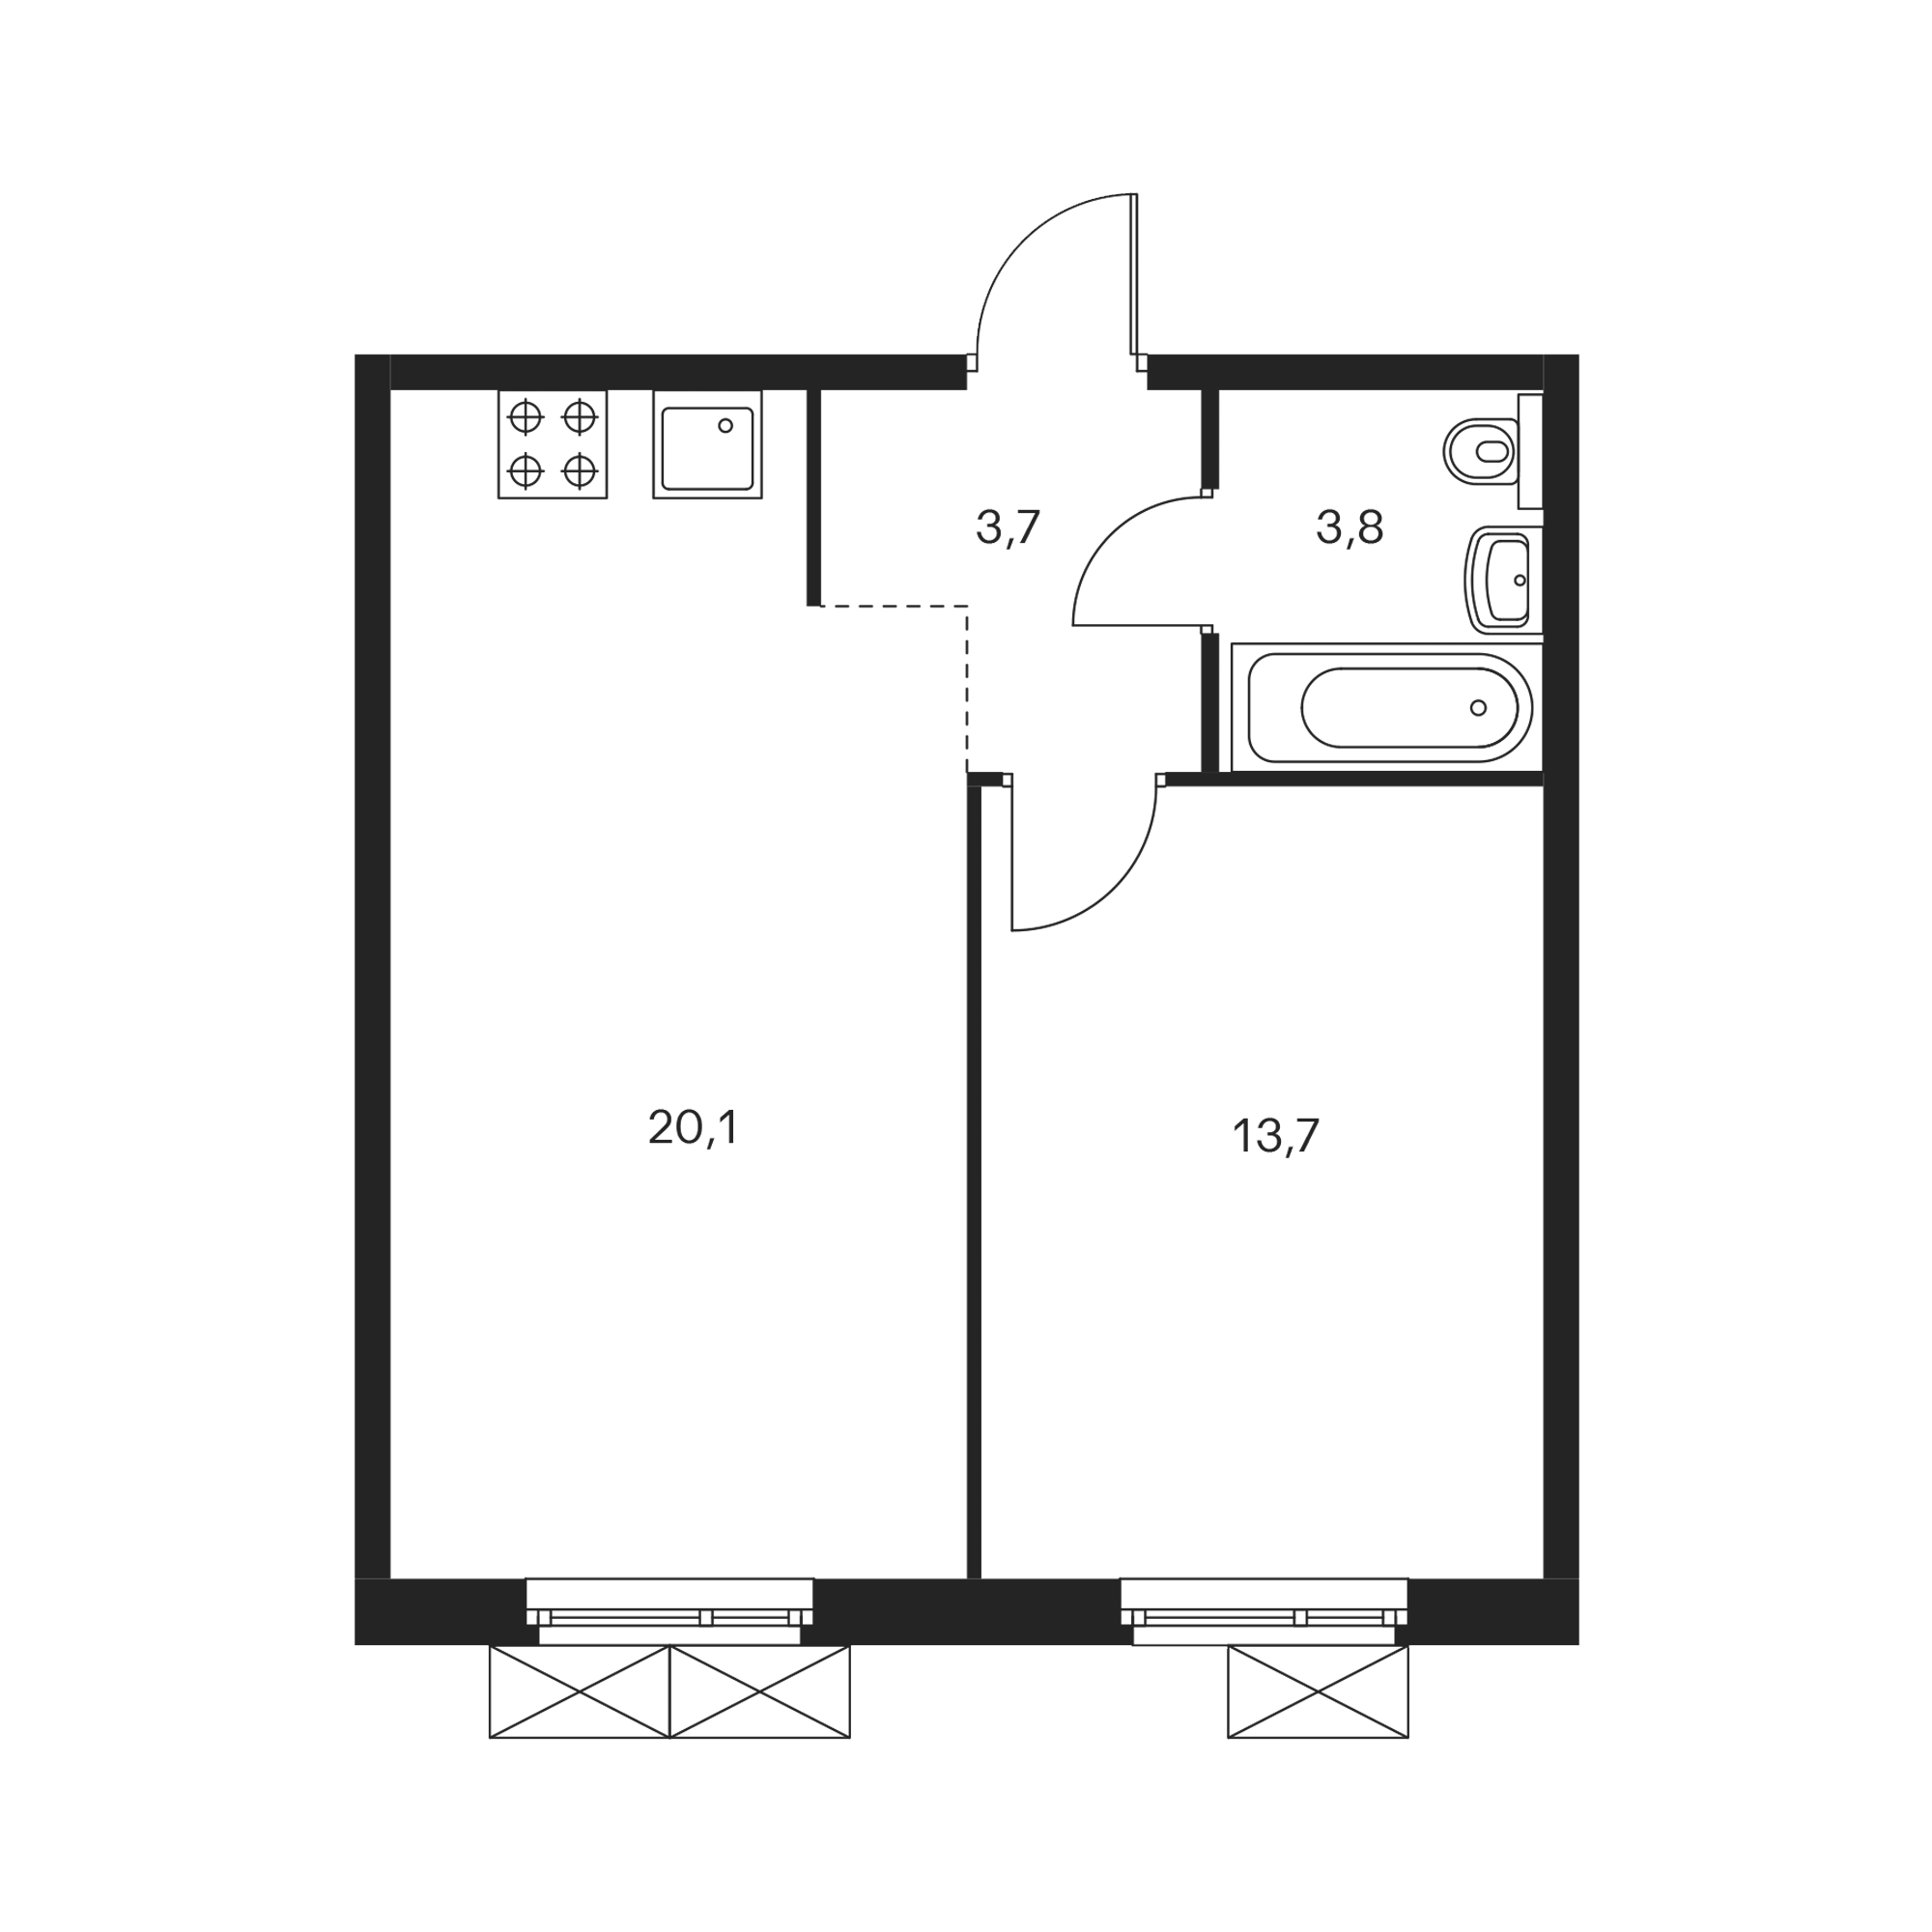 1EL1-2